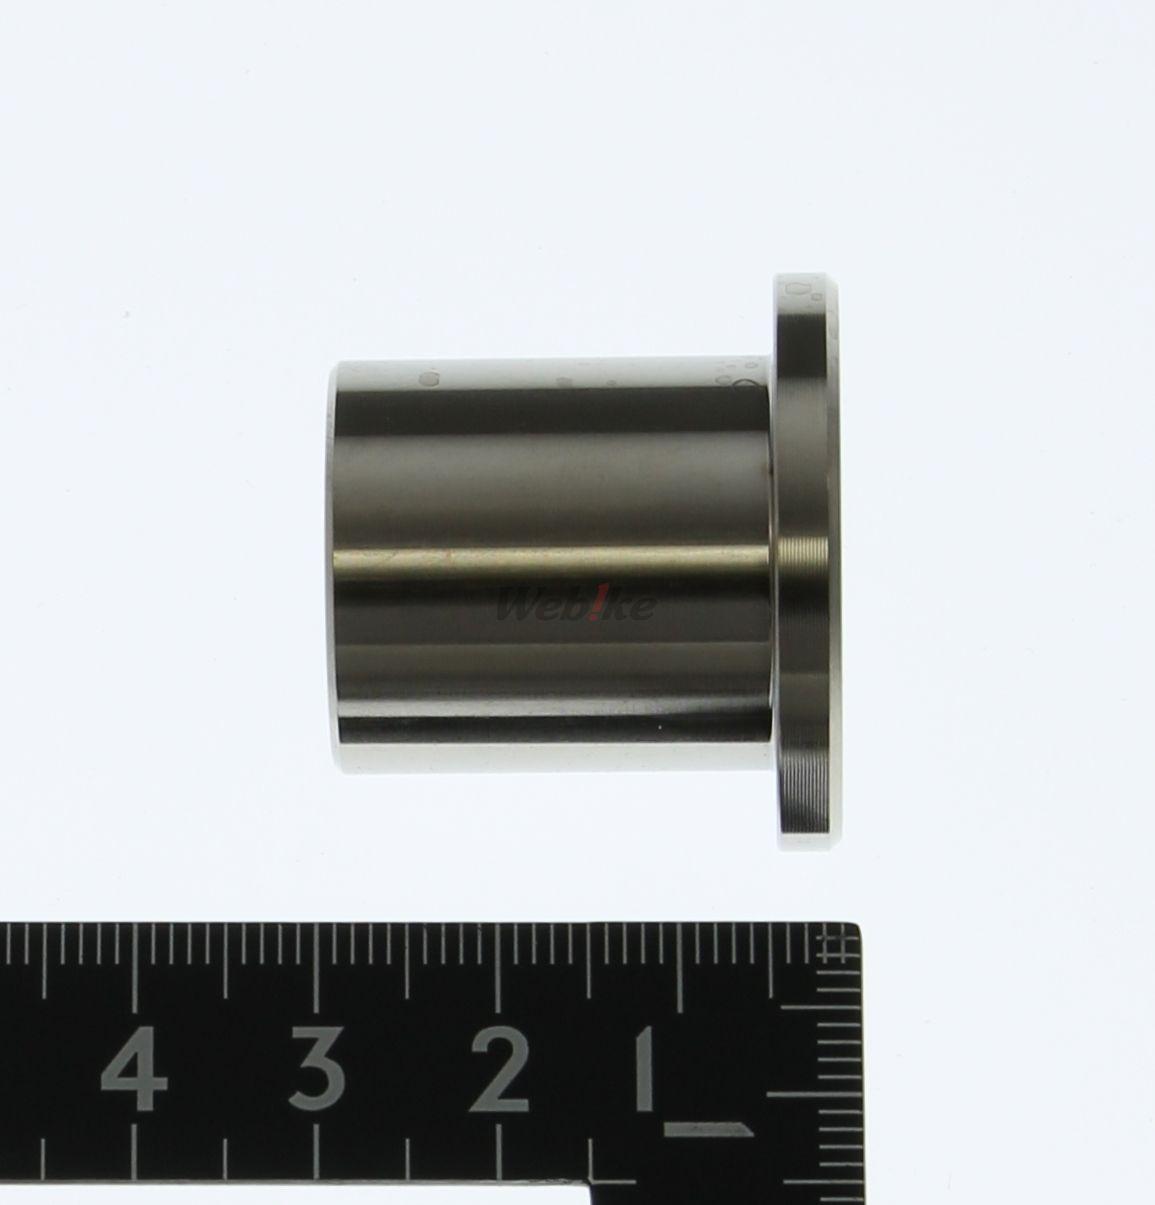 【JB POWER(BITO R&D)】中空鉻鉬合金輪軸芯螺絲締結用螺帽 - 「Webike-摩托百貨」